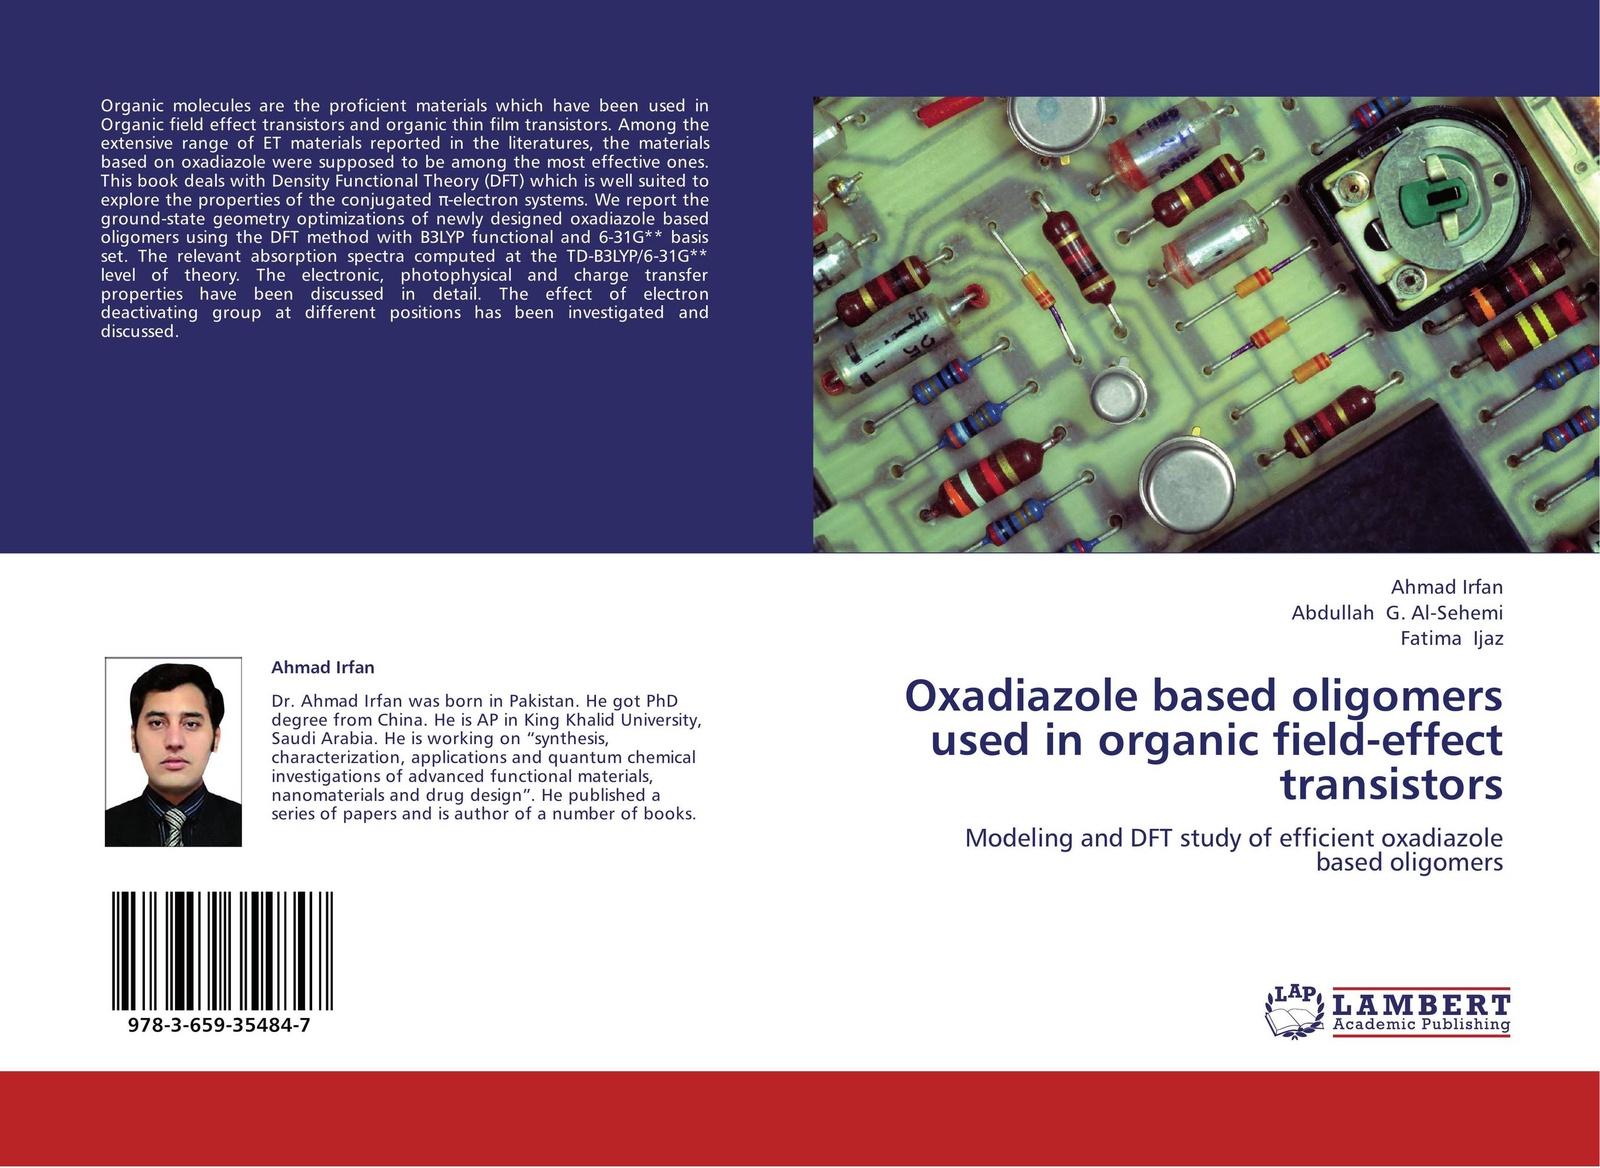 Ahmad Irfan,Abdullah G. Al-Sehemi and Fatima Ijaz Oxadiazole based oligomers used in organic field-effect transistors 50pcs free shipping mpsa13 a13 to 92 darlington transistors 500ma 30v npn